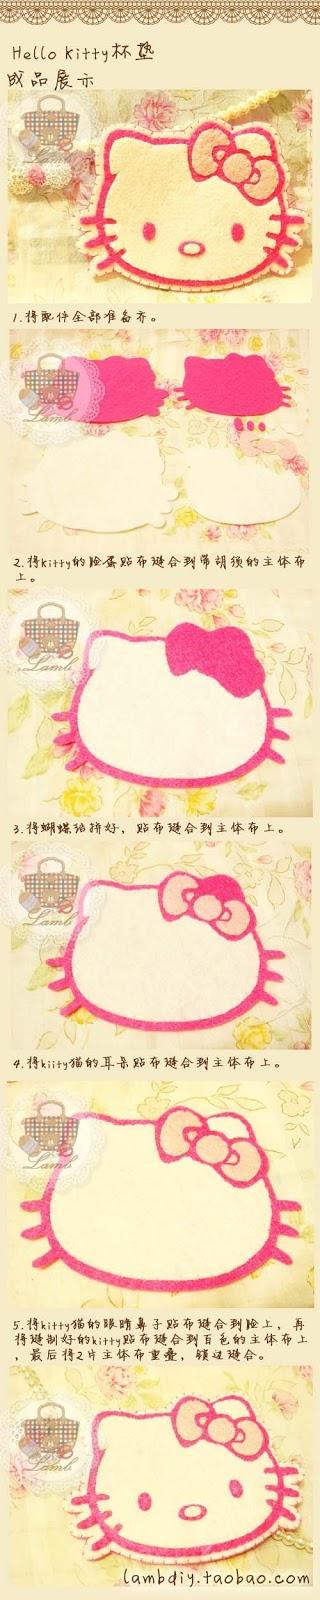 Tutorial paso a paso, boche de fieltro Hello Kitty